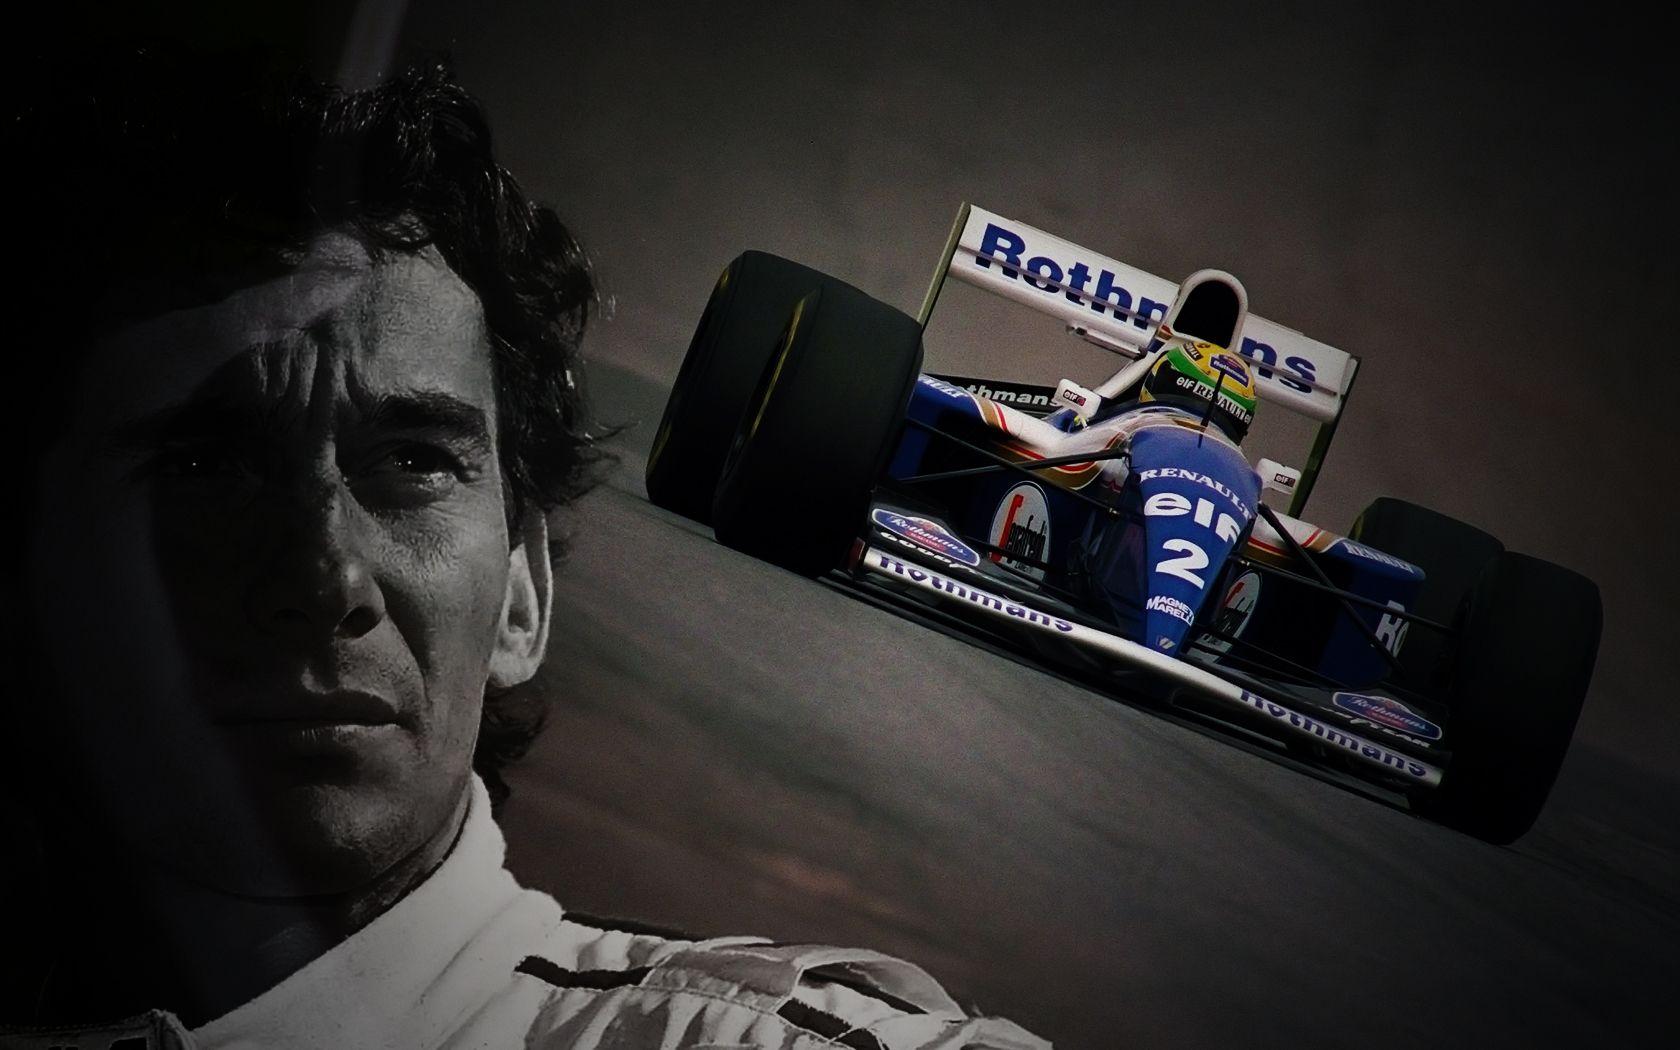 Ayrton Senna Wallpaper Google Zoeken Ayrton Senna San